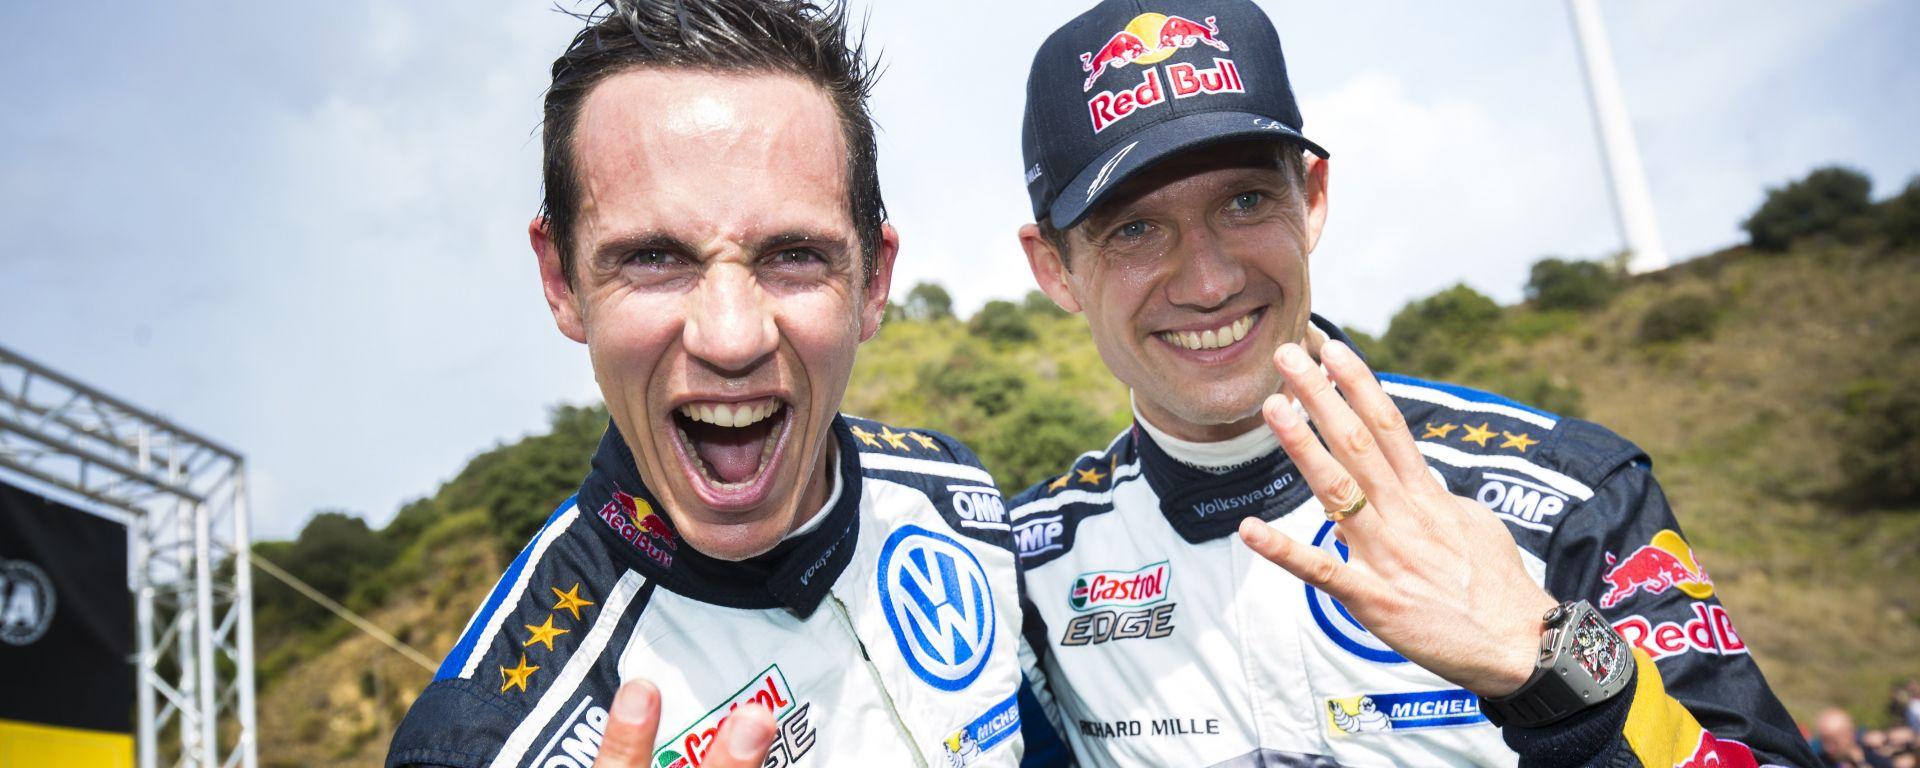 Ecco i campioni! Sébastien Ogier / Julien Ingrassia - Rally Spagna 2016